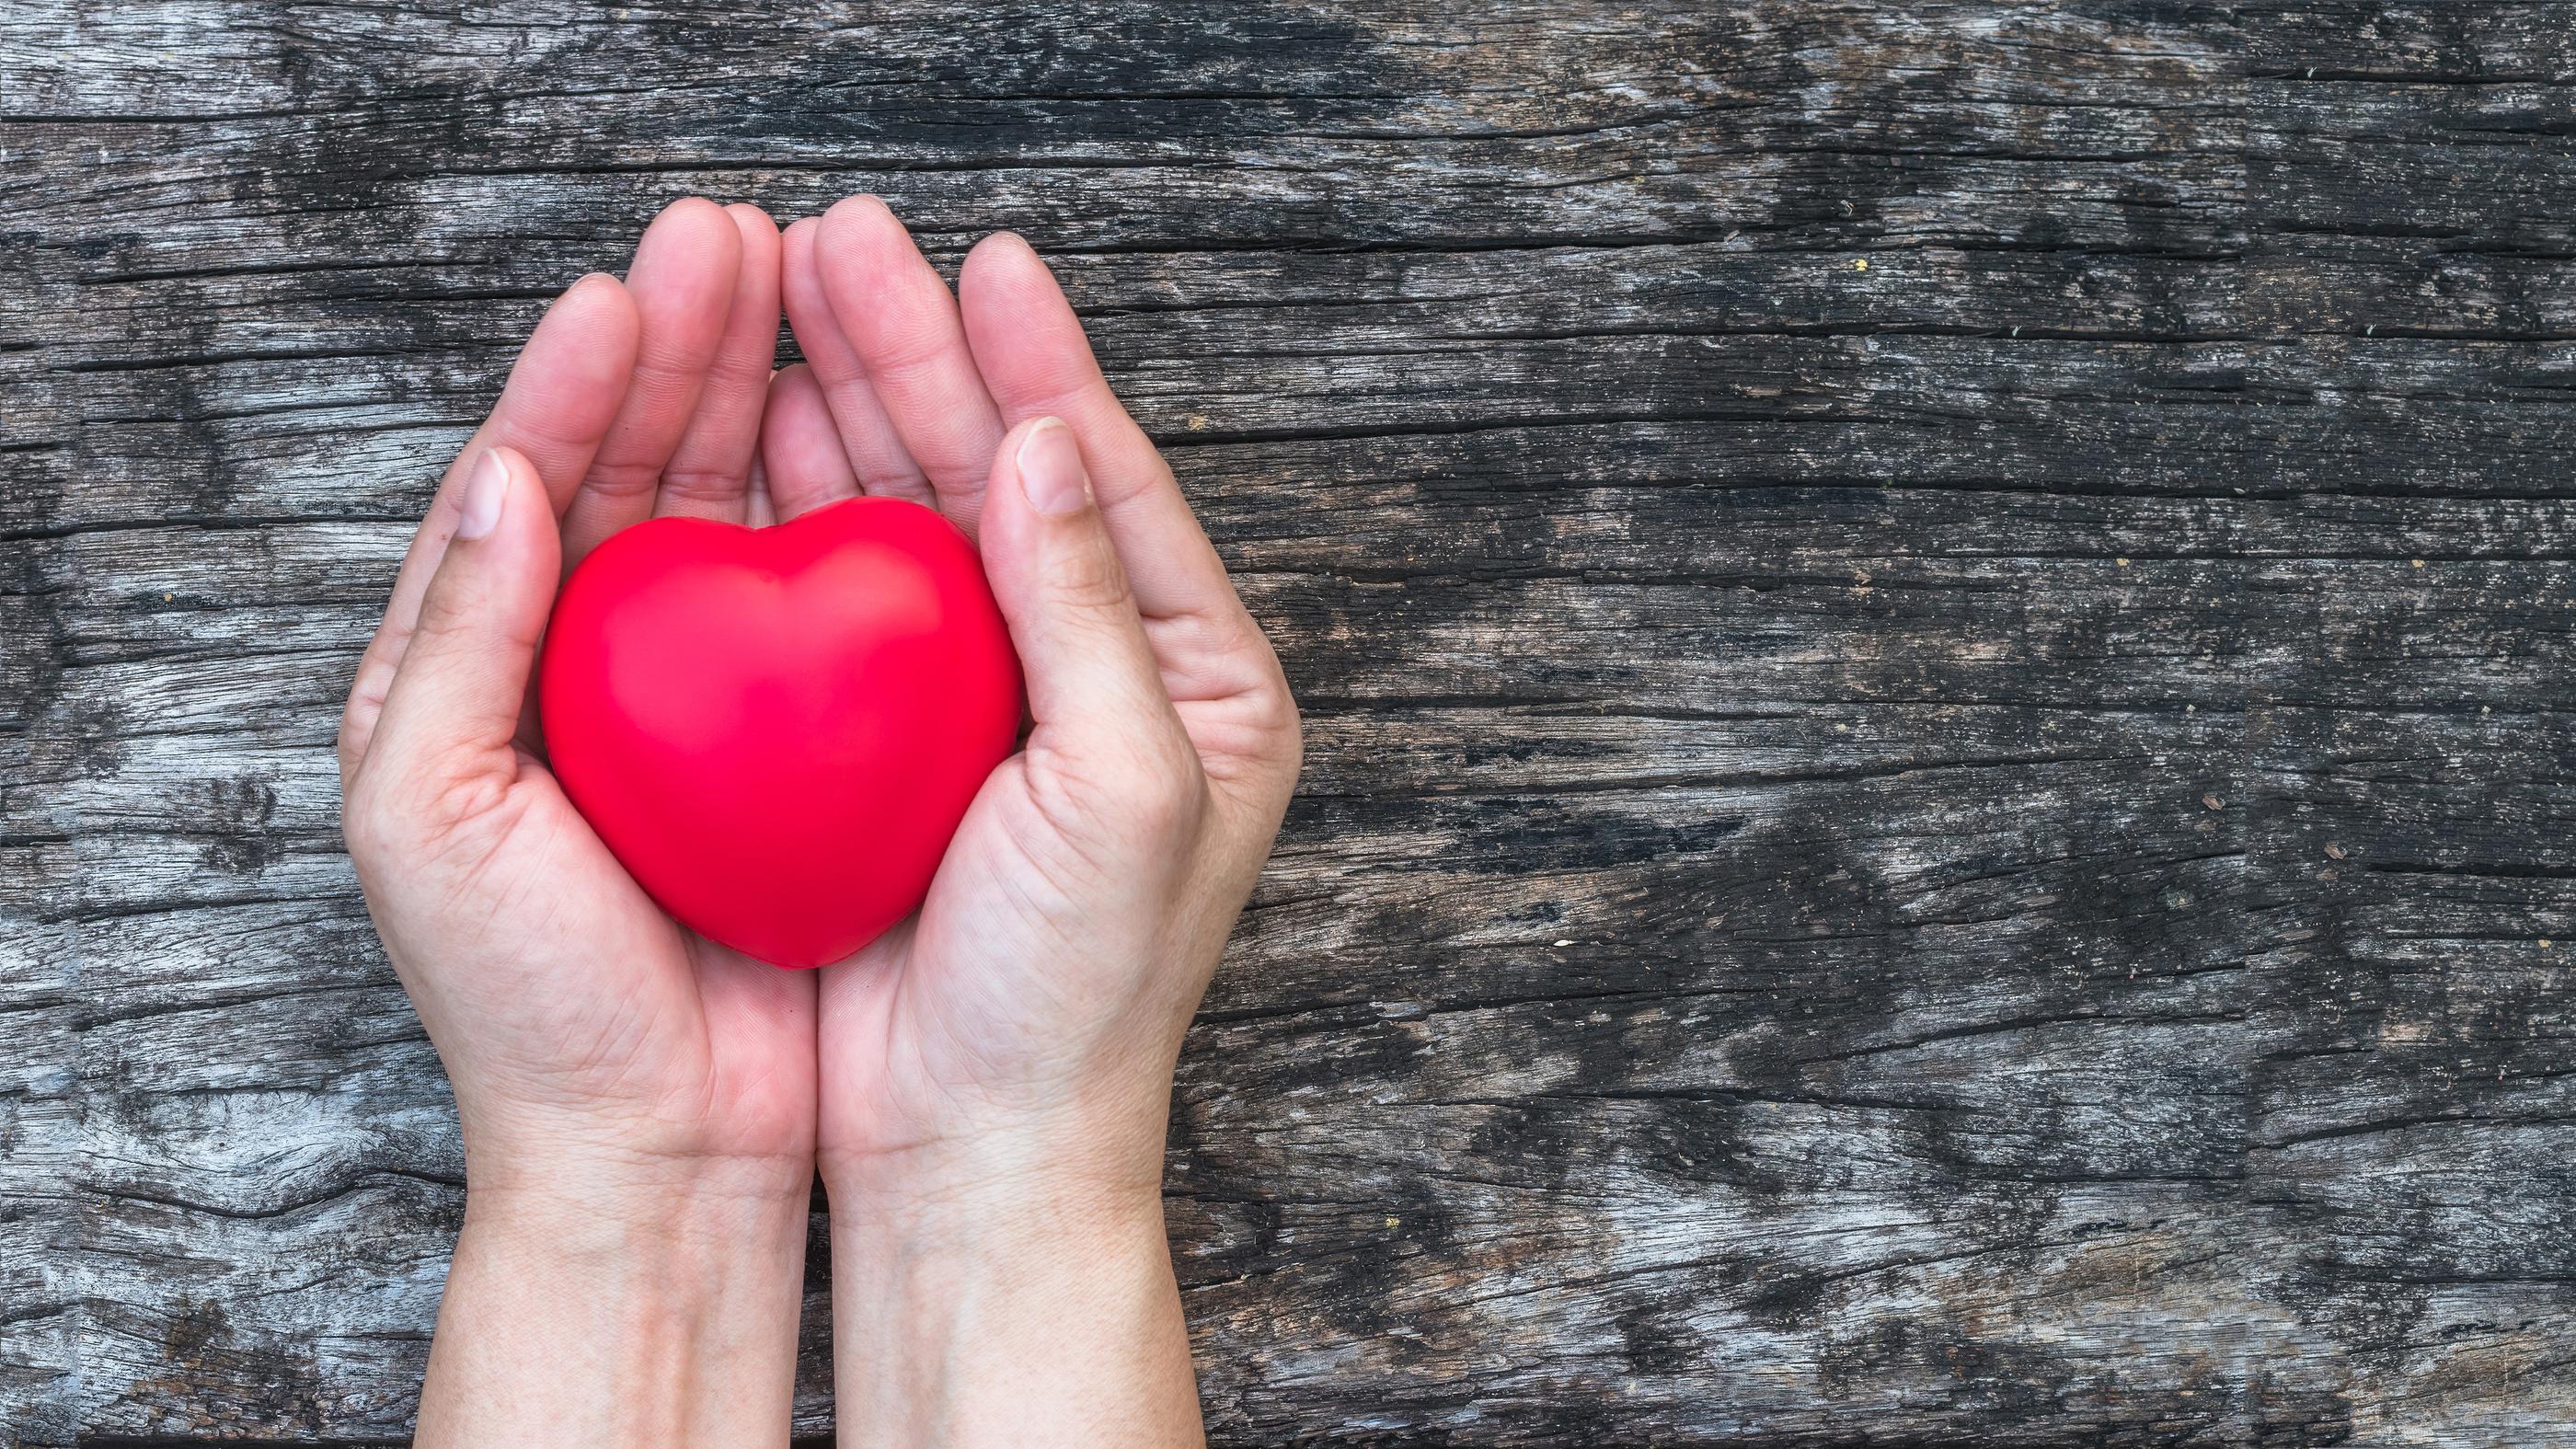 bigstock-Heart-Health-Care-Medical-Card-236311648